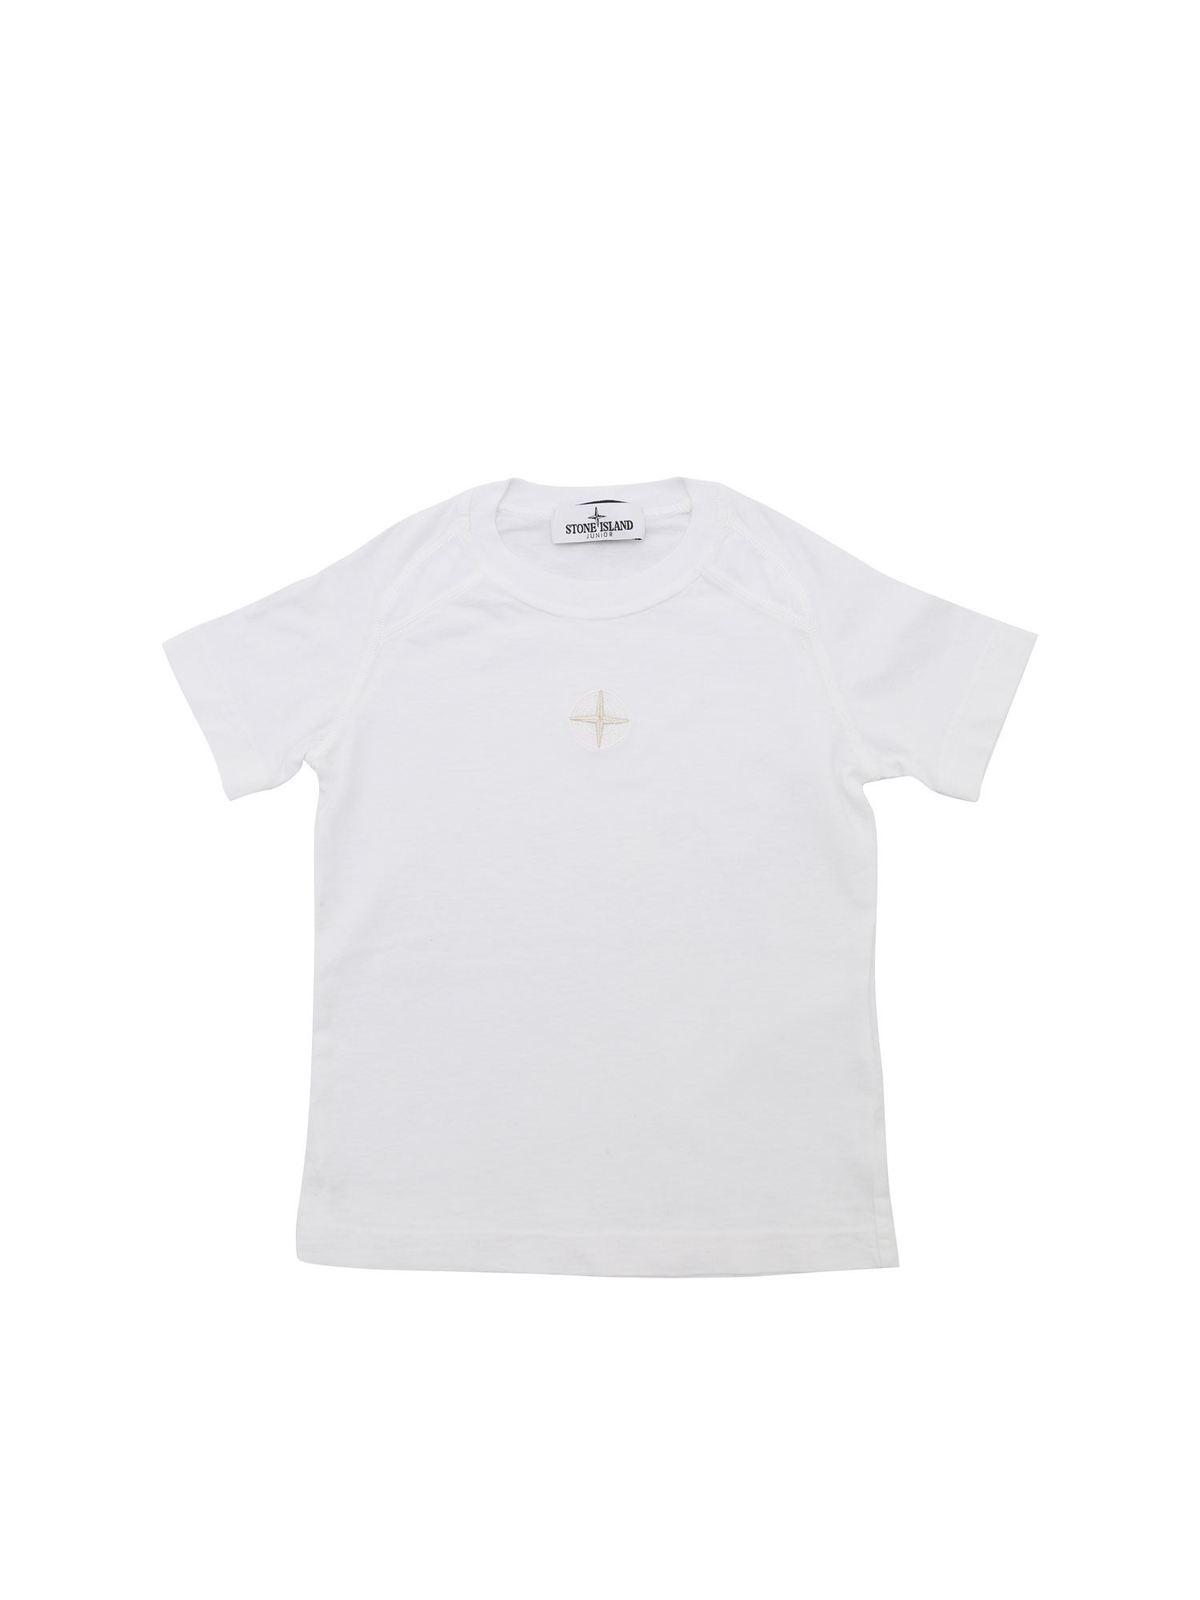 Stone Island Junior LOGO T-SHIRT IN WHITE